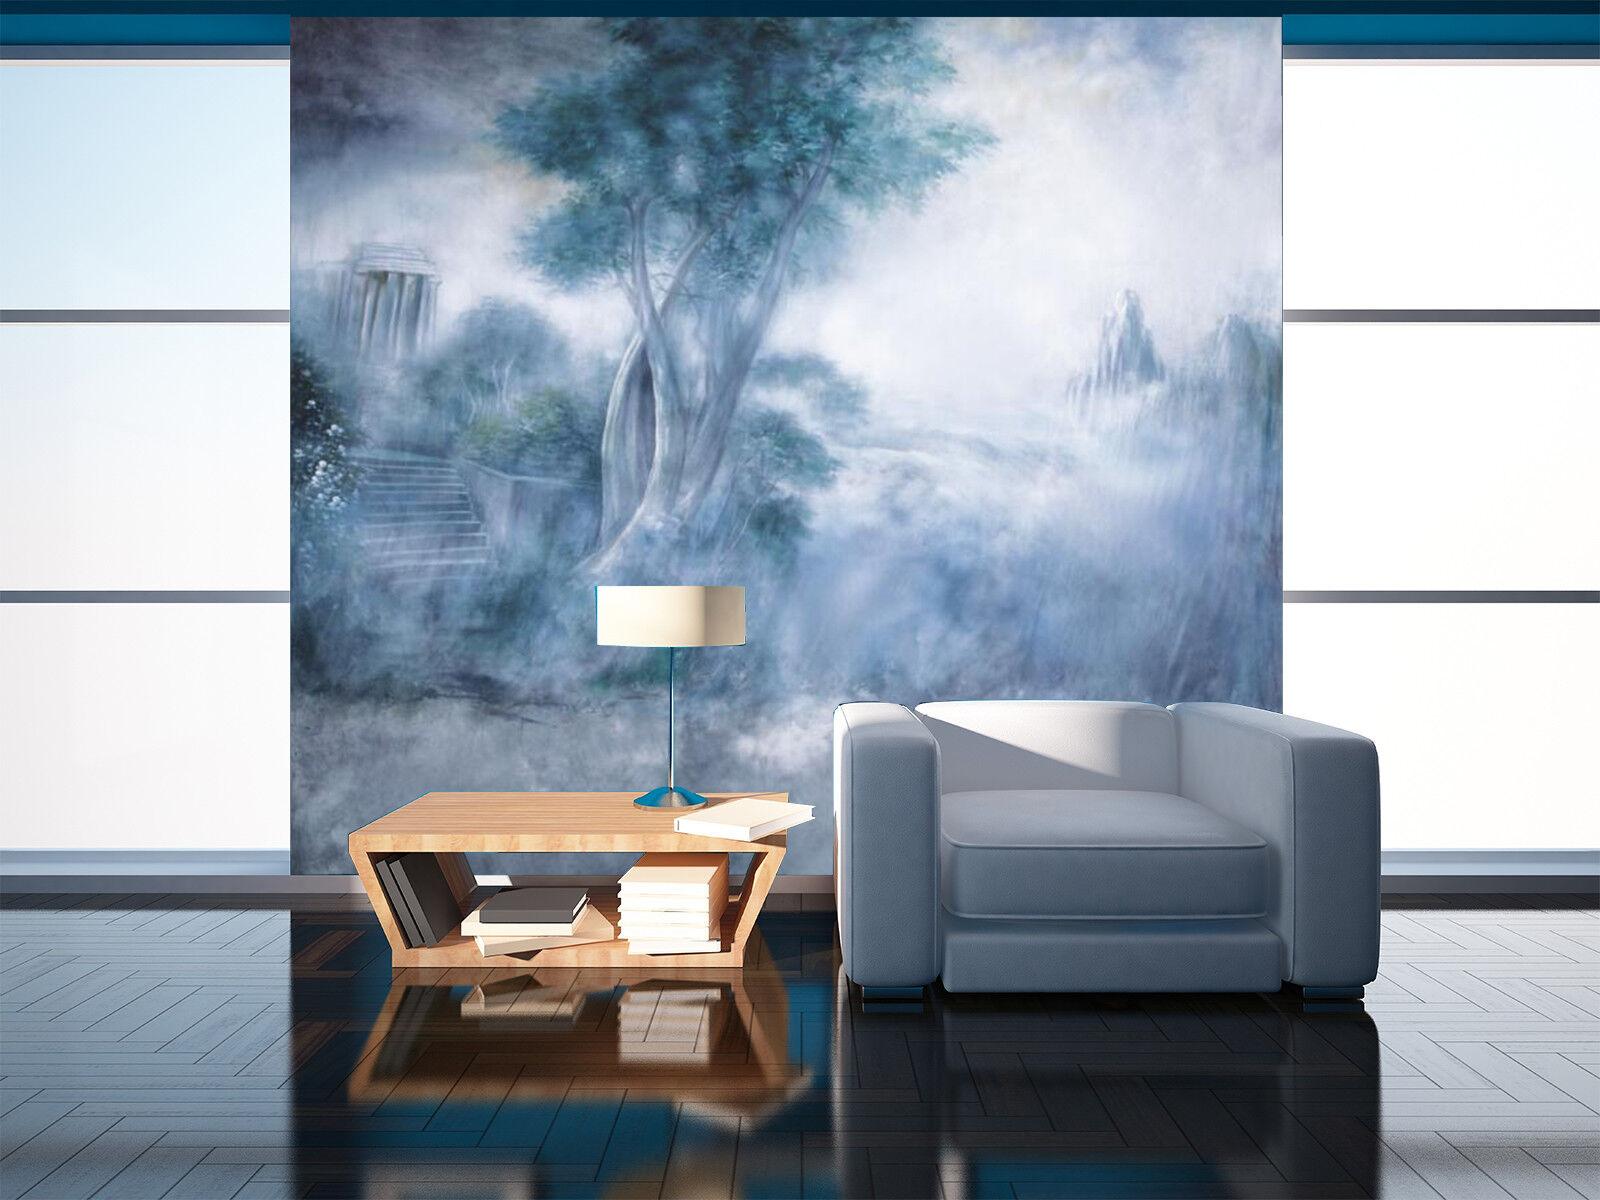 3D Tree Painting 4 Wallpaper Murals Wall Print Wallpaper Mural AJ WALL AU Lemon